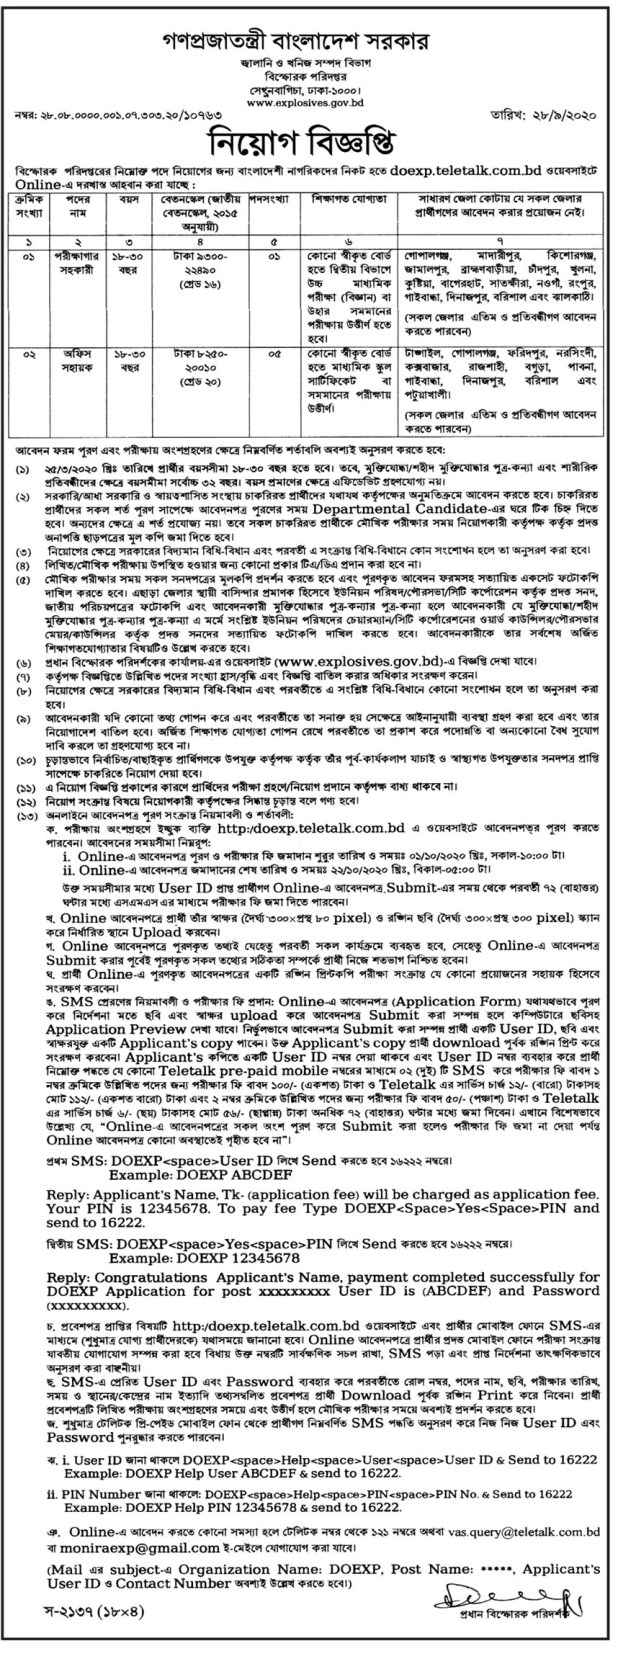 Directorate of Explosives Job Circular 2020